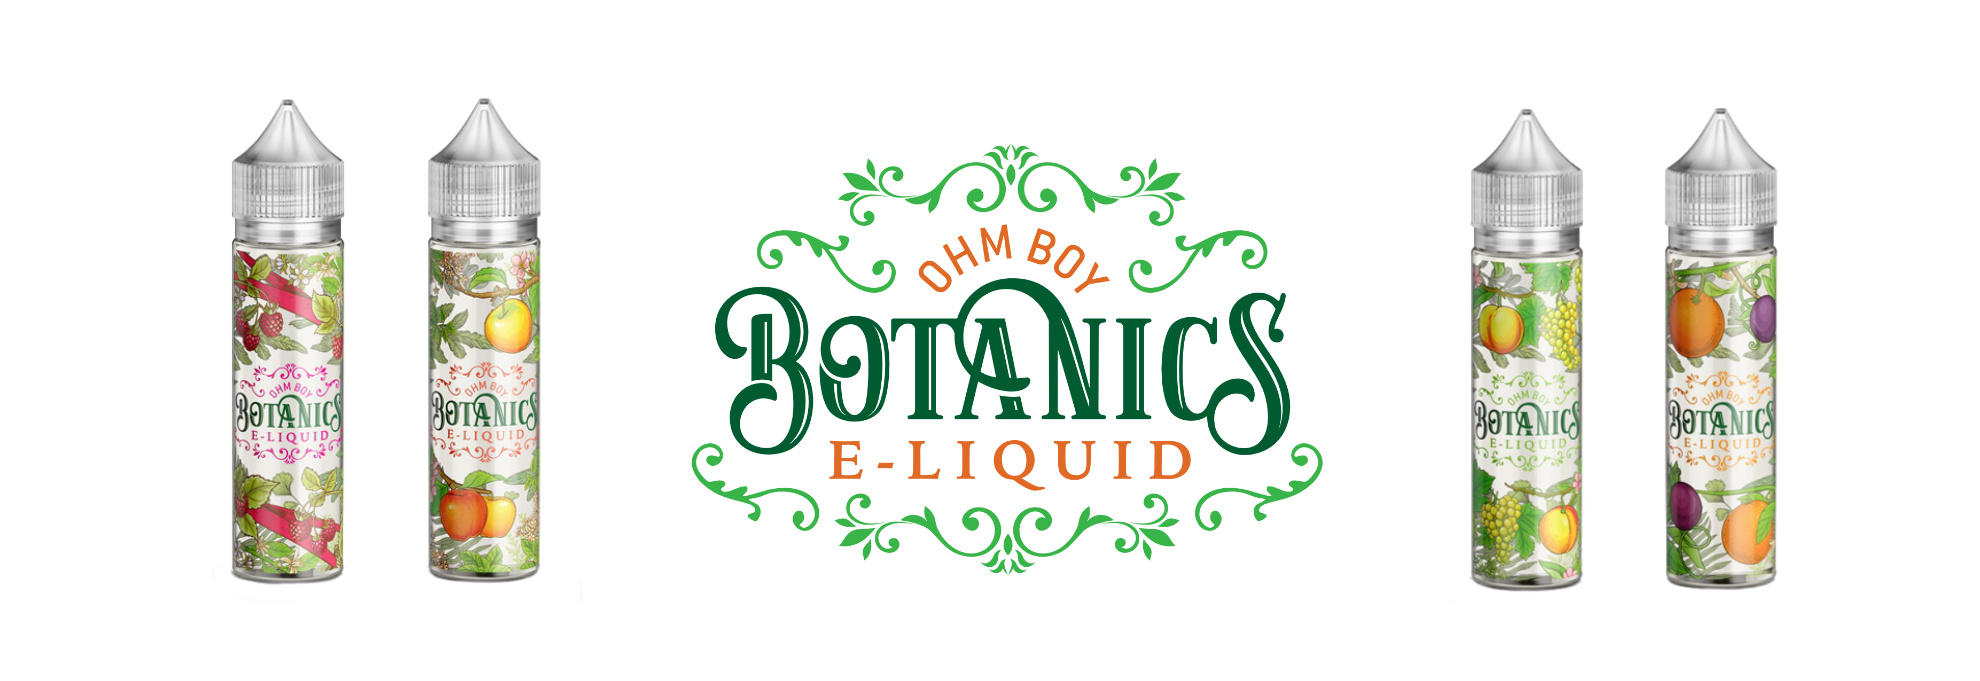 ohm-boy-botanics-eliquid-vapetime.jpg